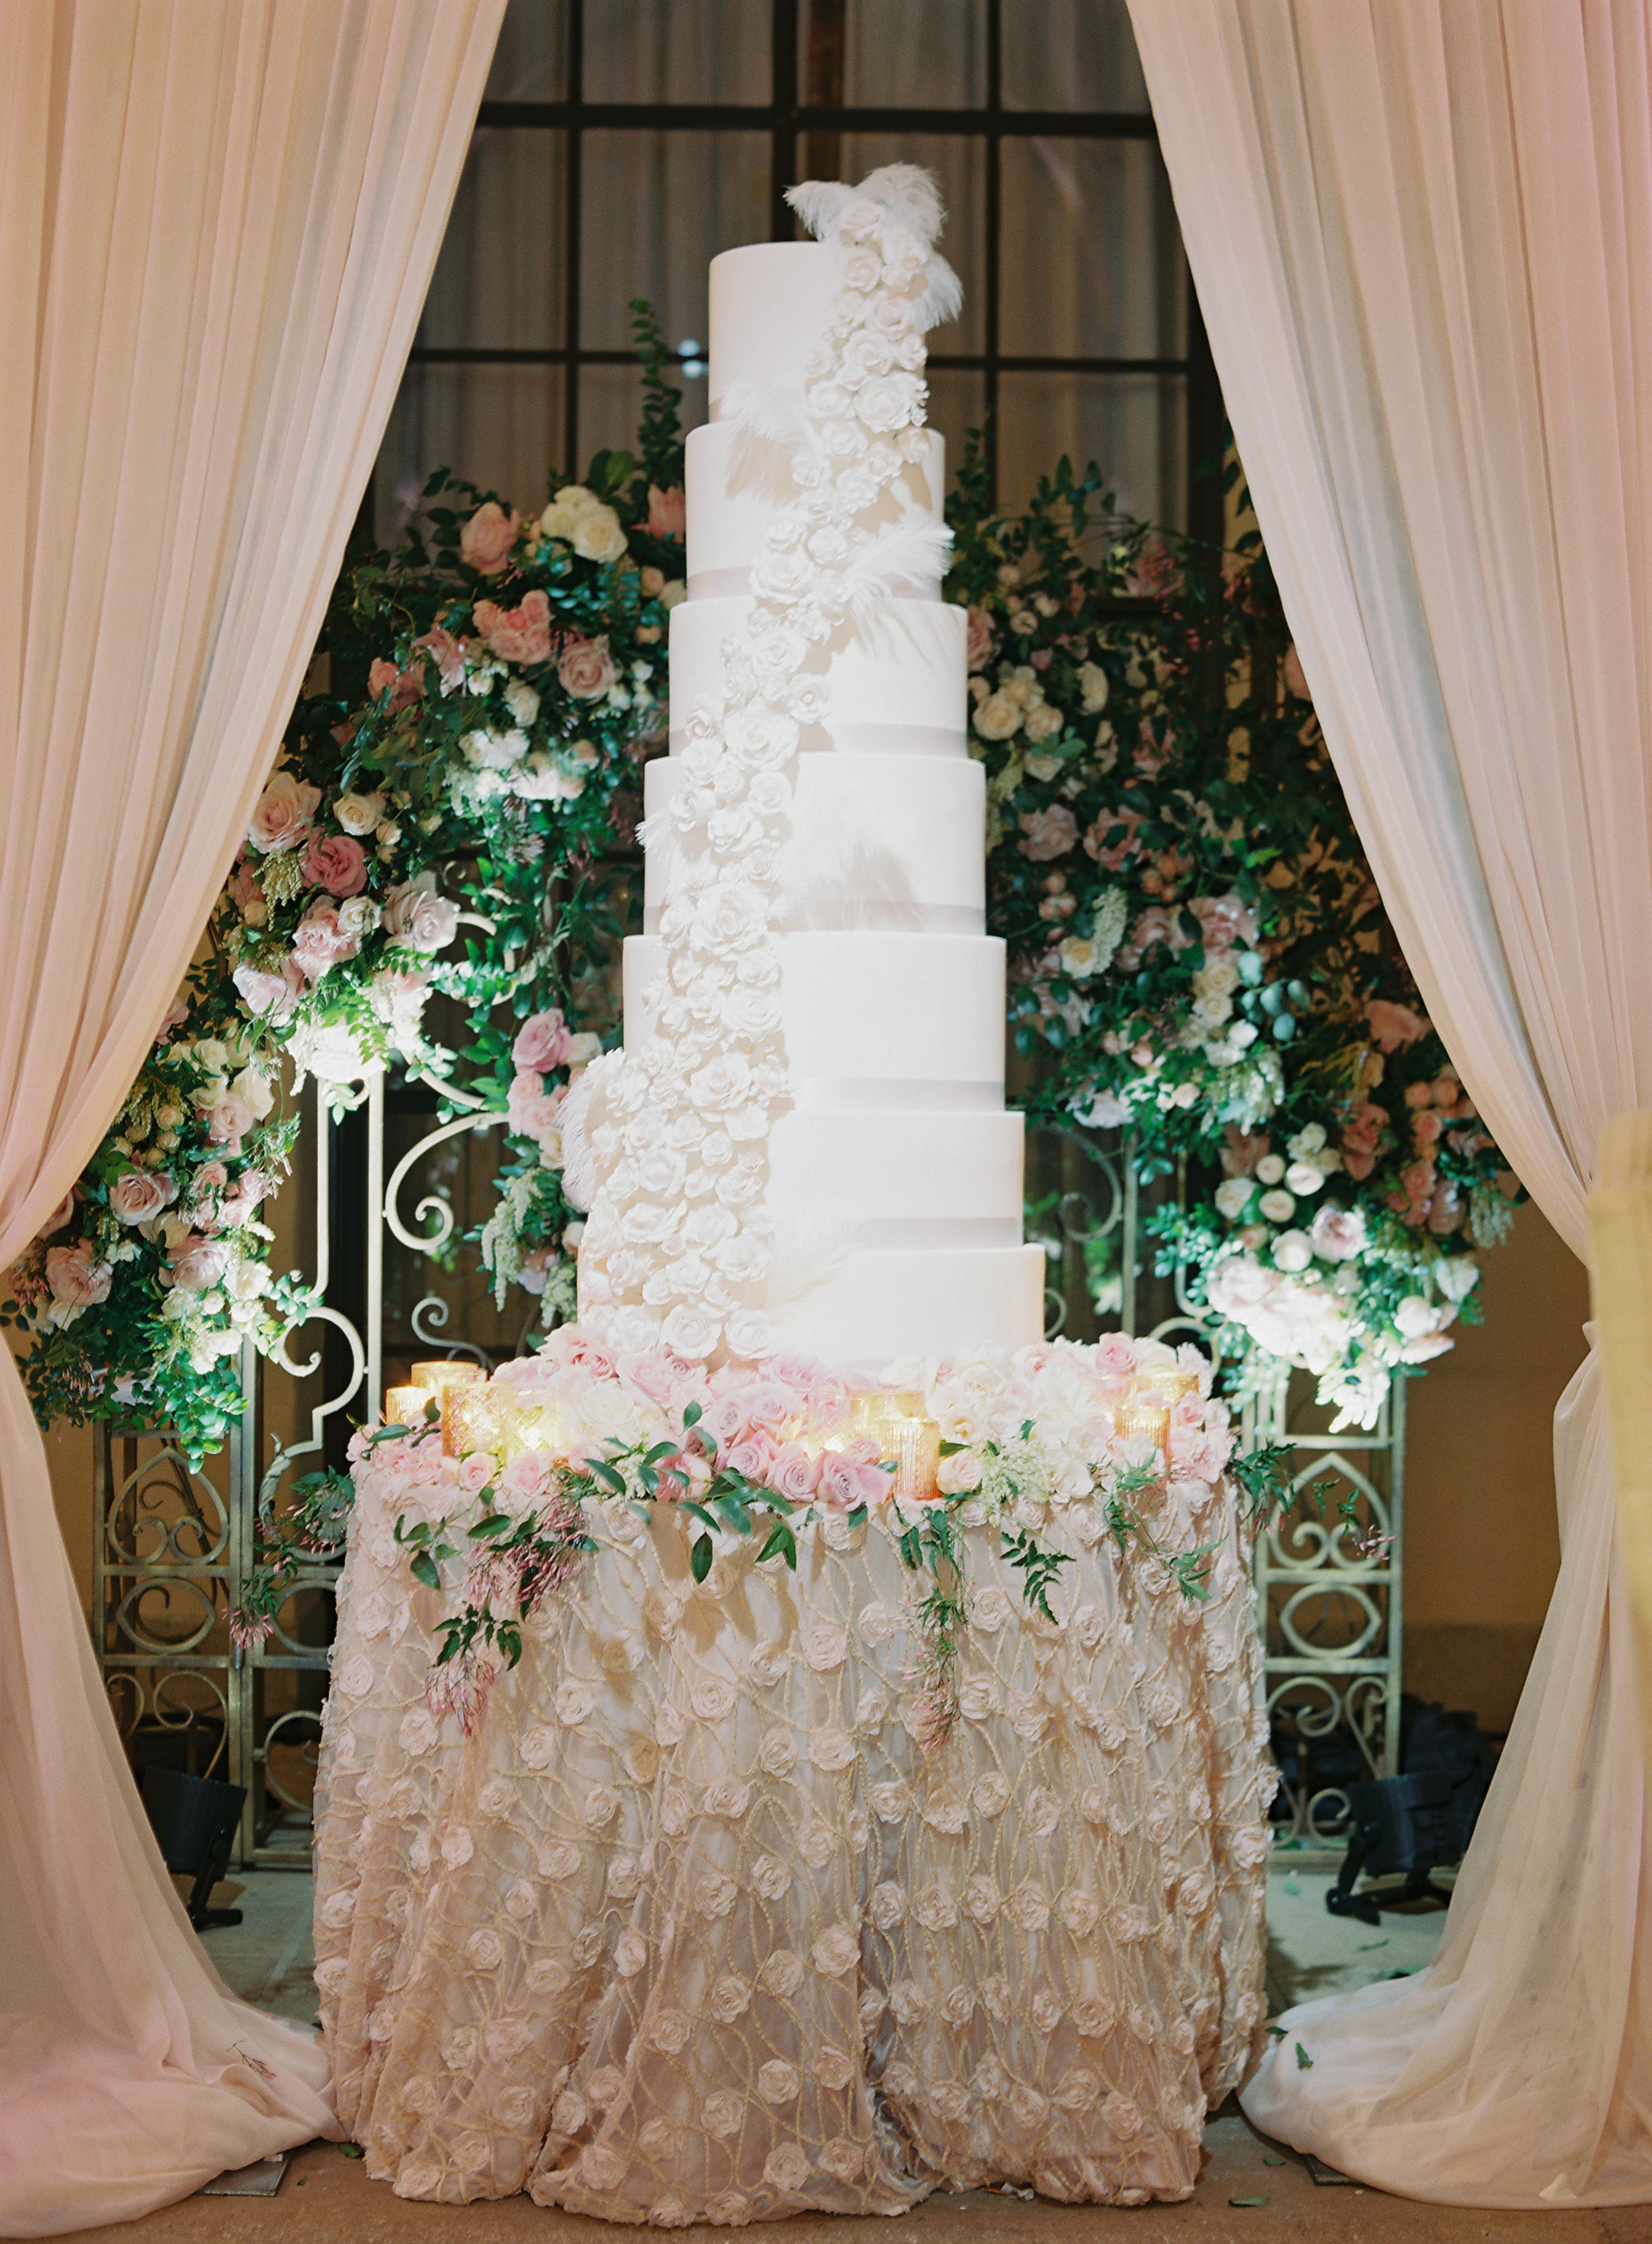 Athenaeum_Wedding_Hi_Res-83-Jen_Huang-005198-R1-009